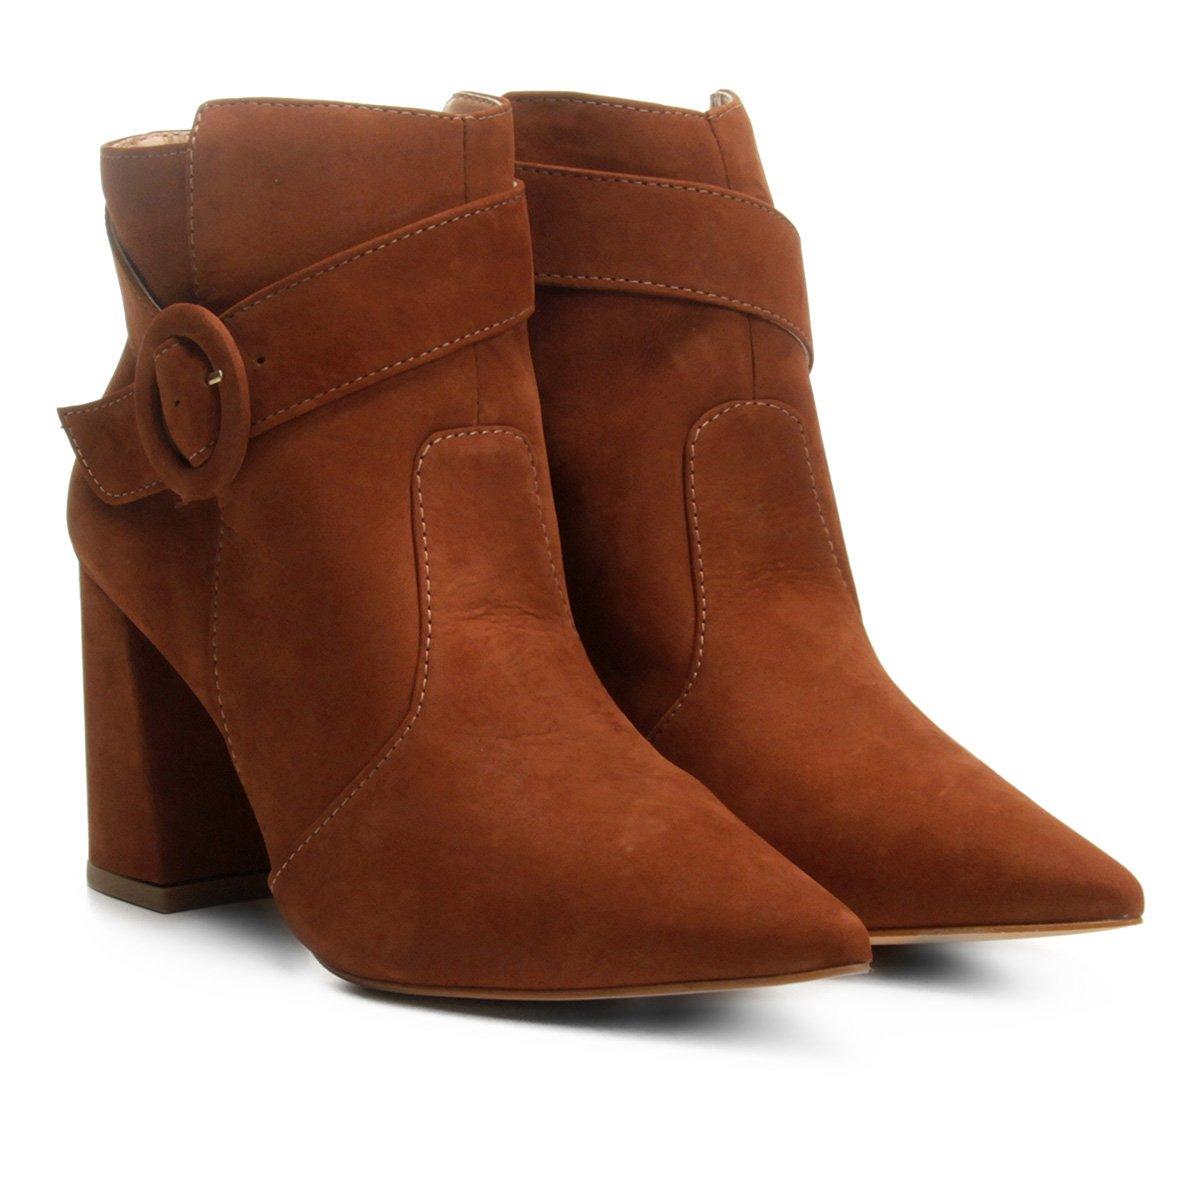 7b763b59a ... Bota Couro Cano Curto Shoestock Fivela Redonda Feminina